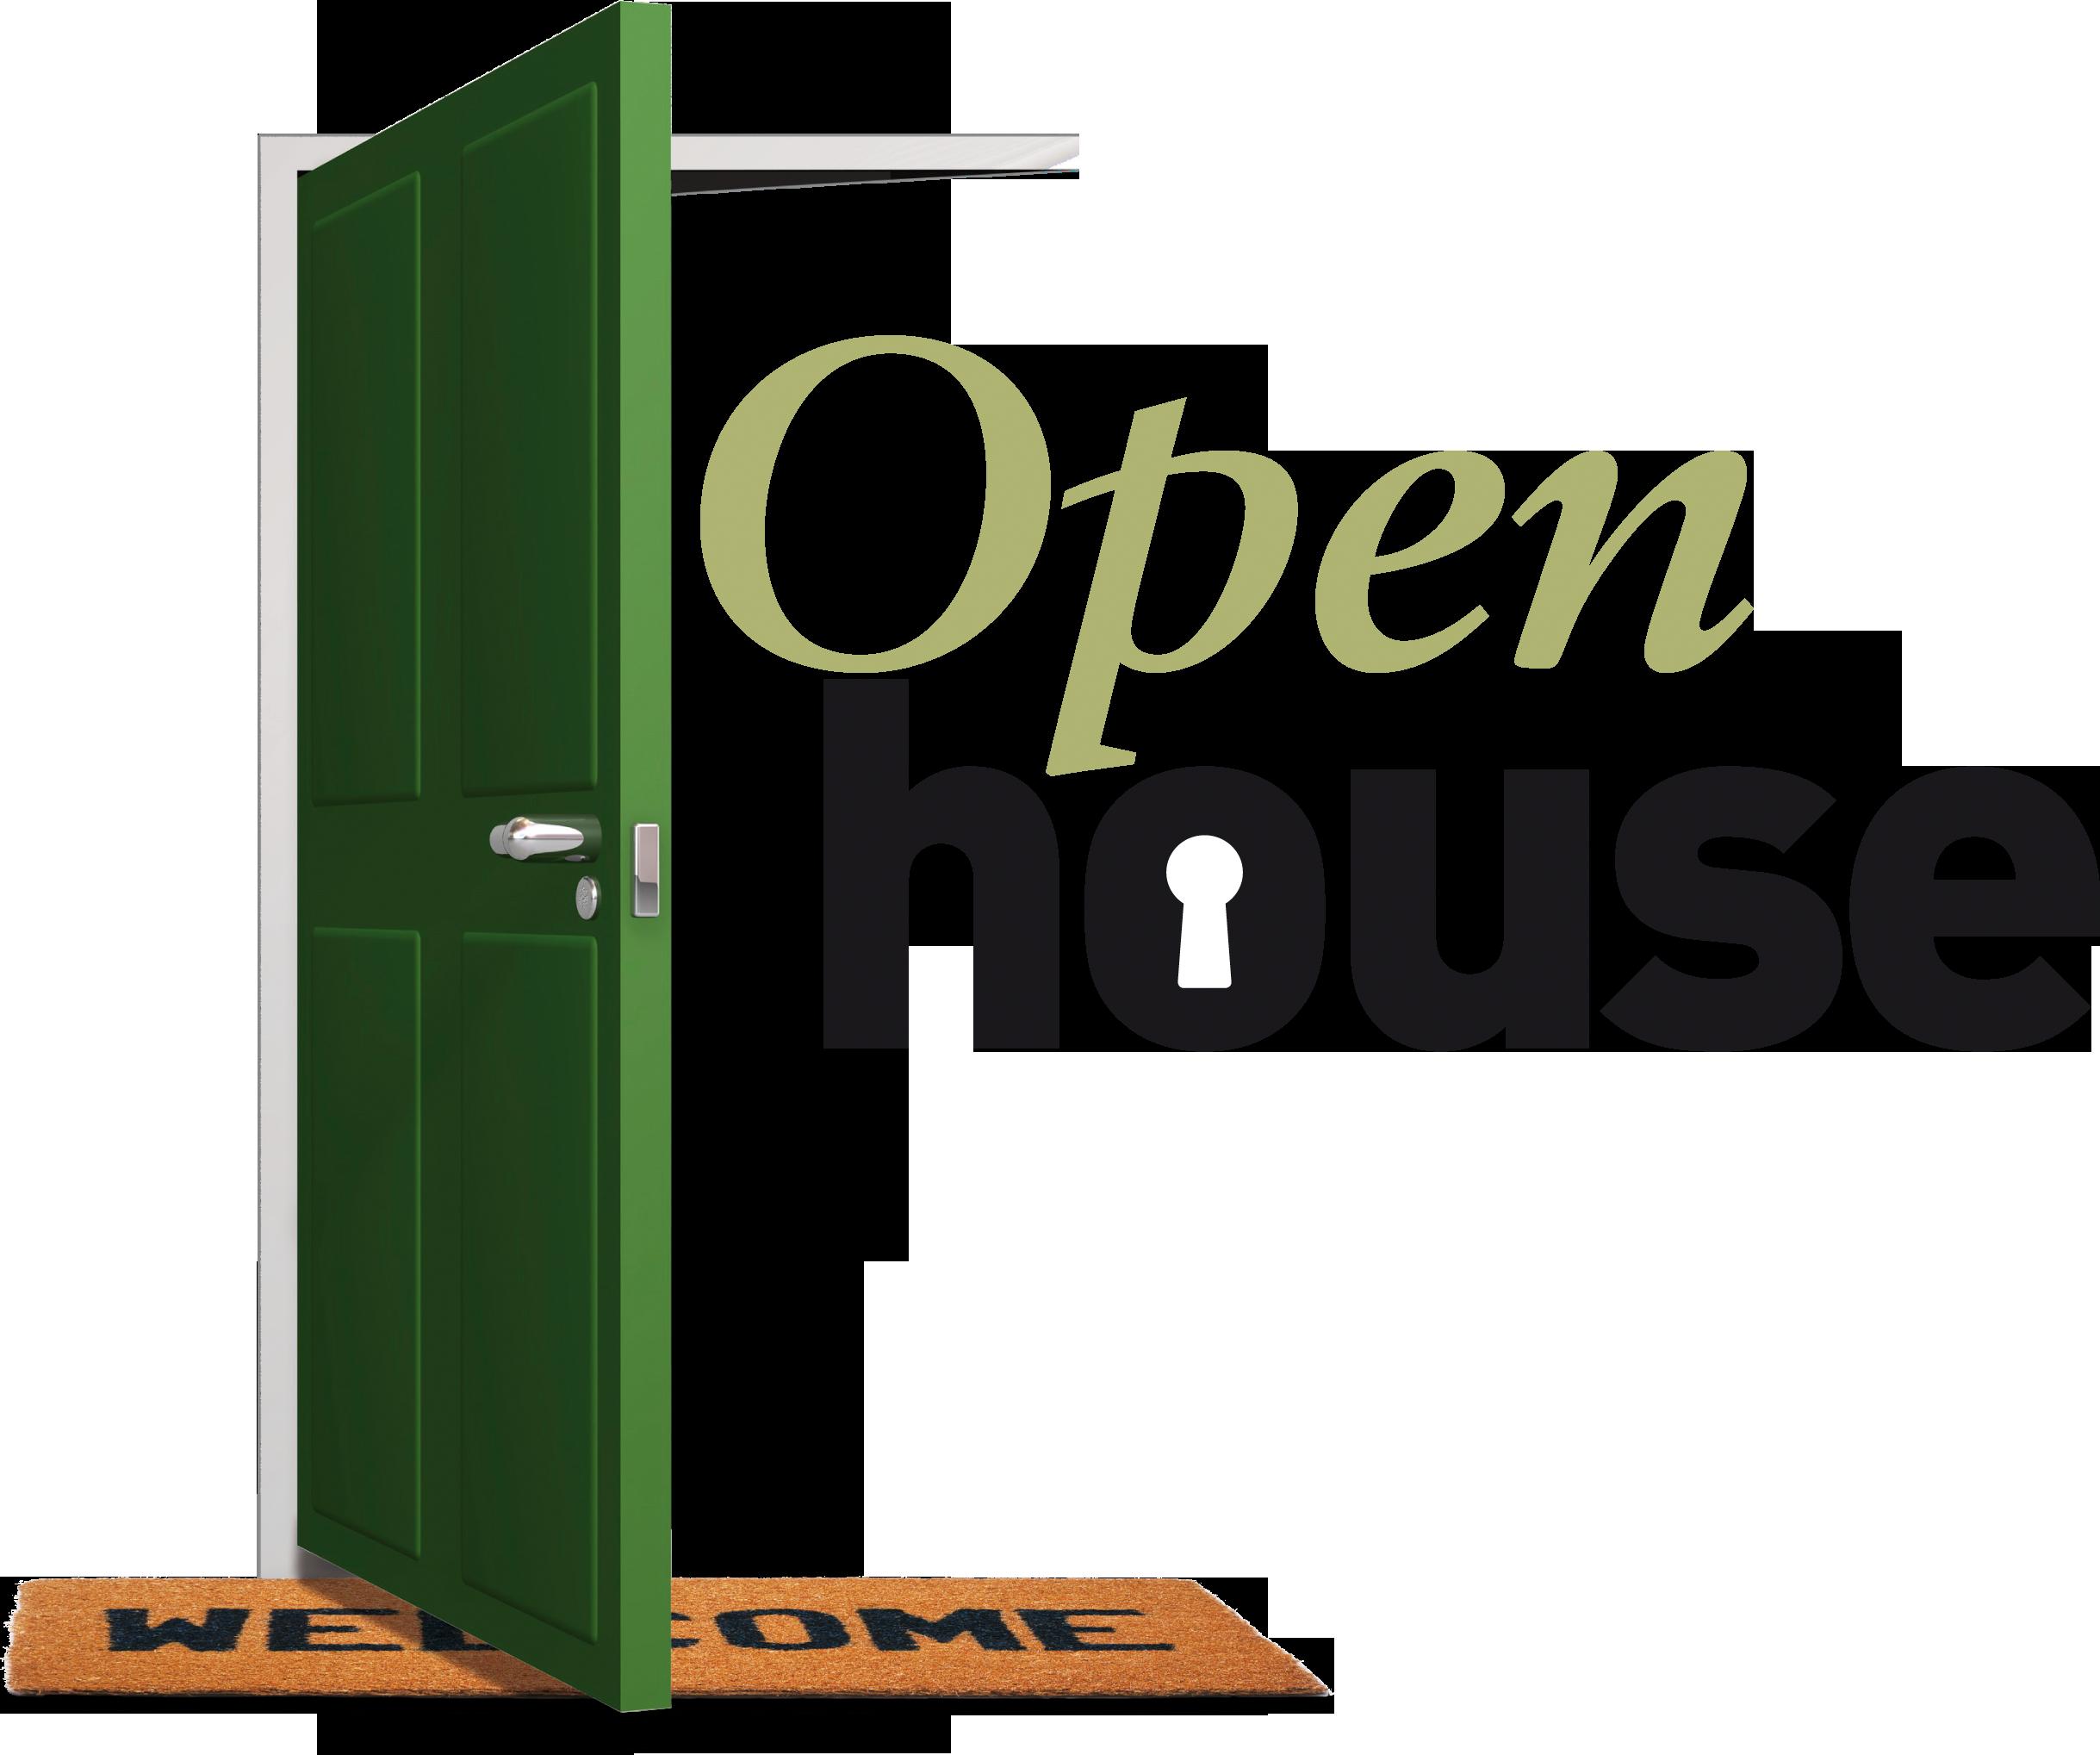 Open house clipart 6